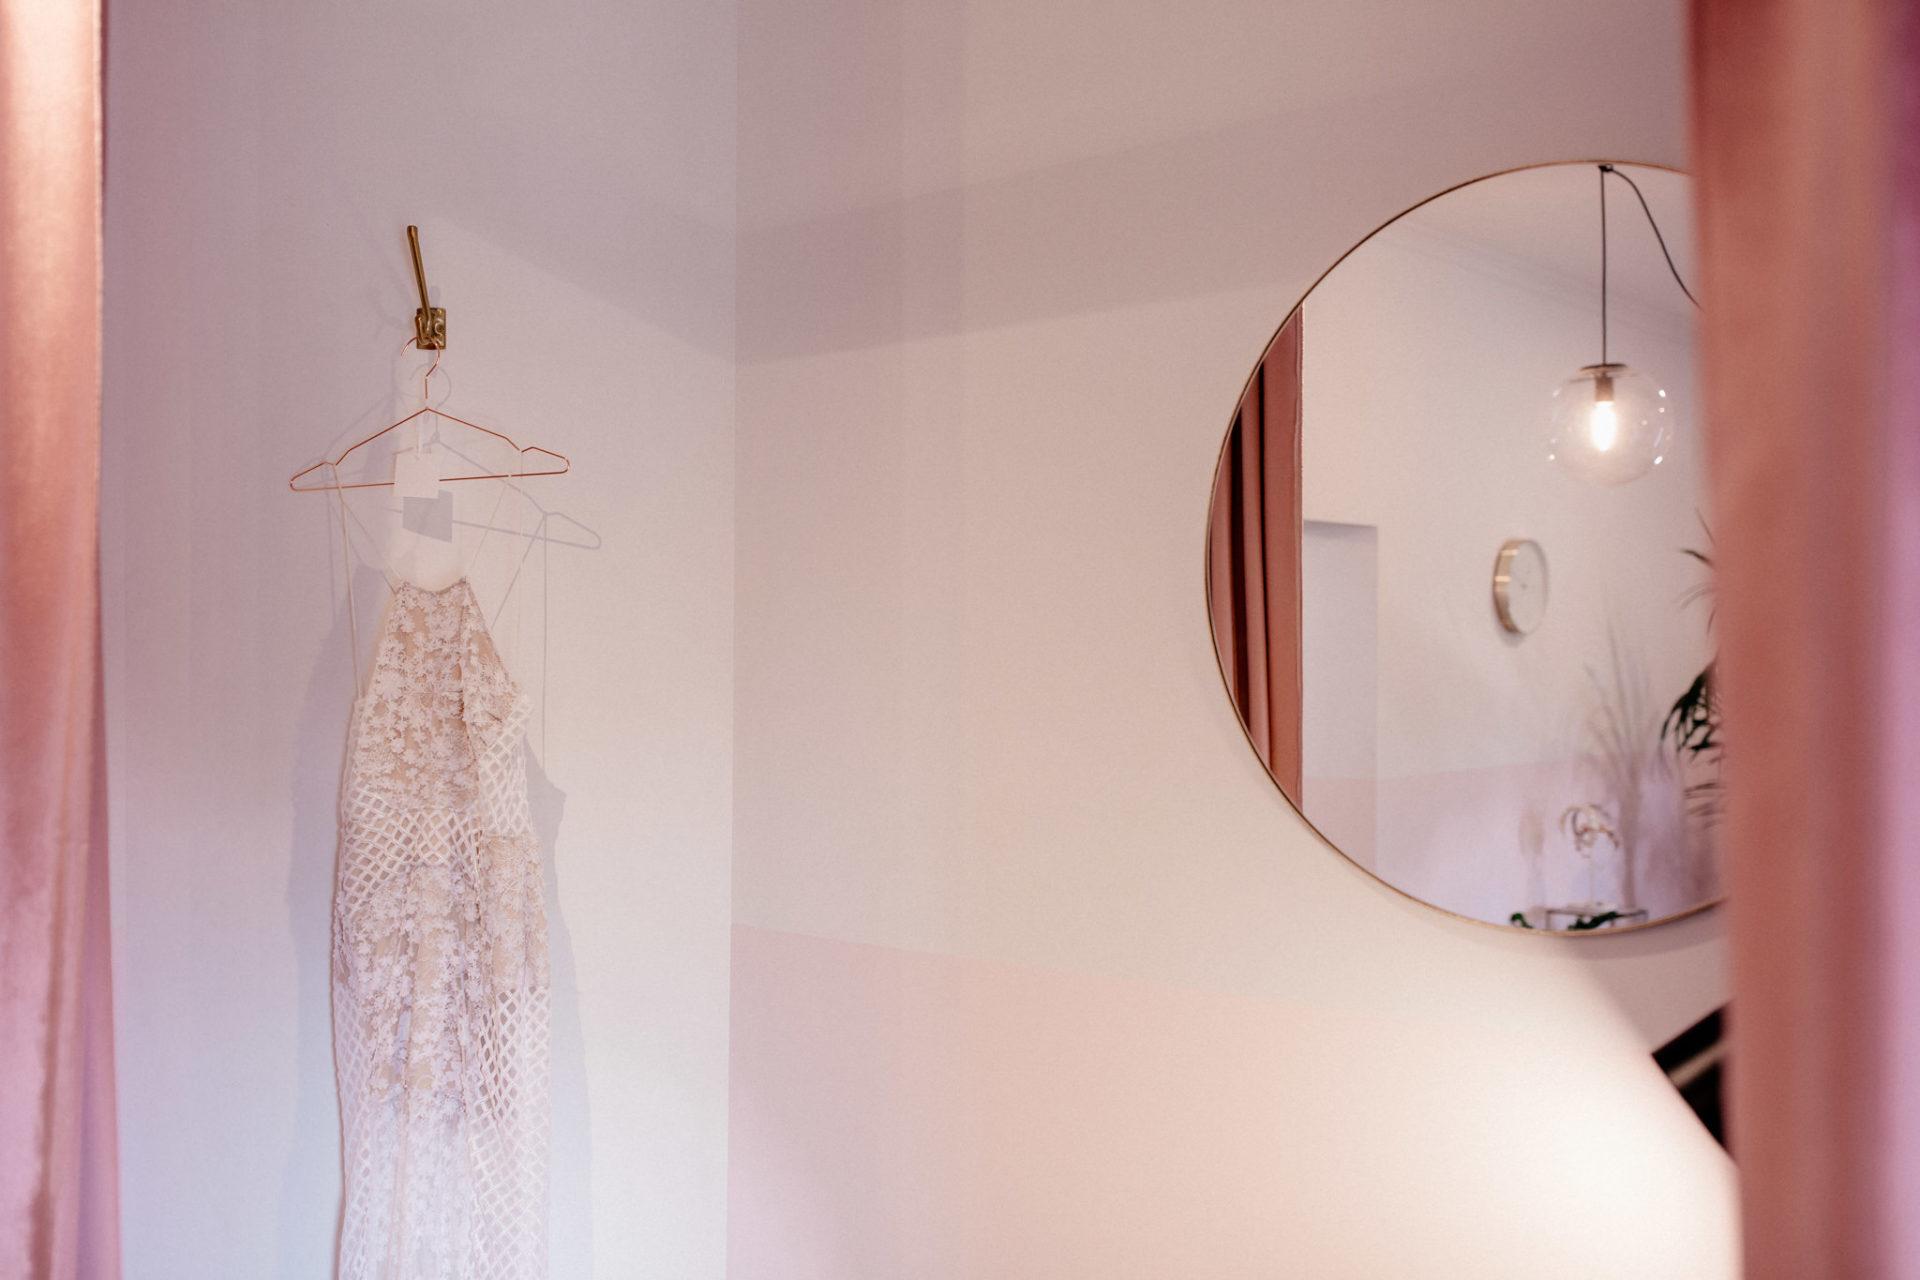 kreative-brautmode-australien-couture-georgia-young-studio-umkleidekabine-brautkleid-aussuchen